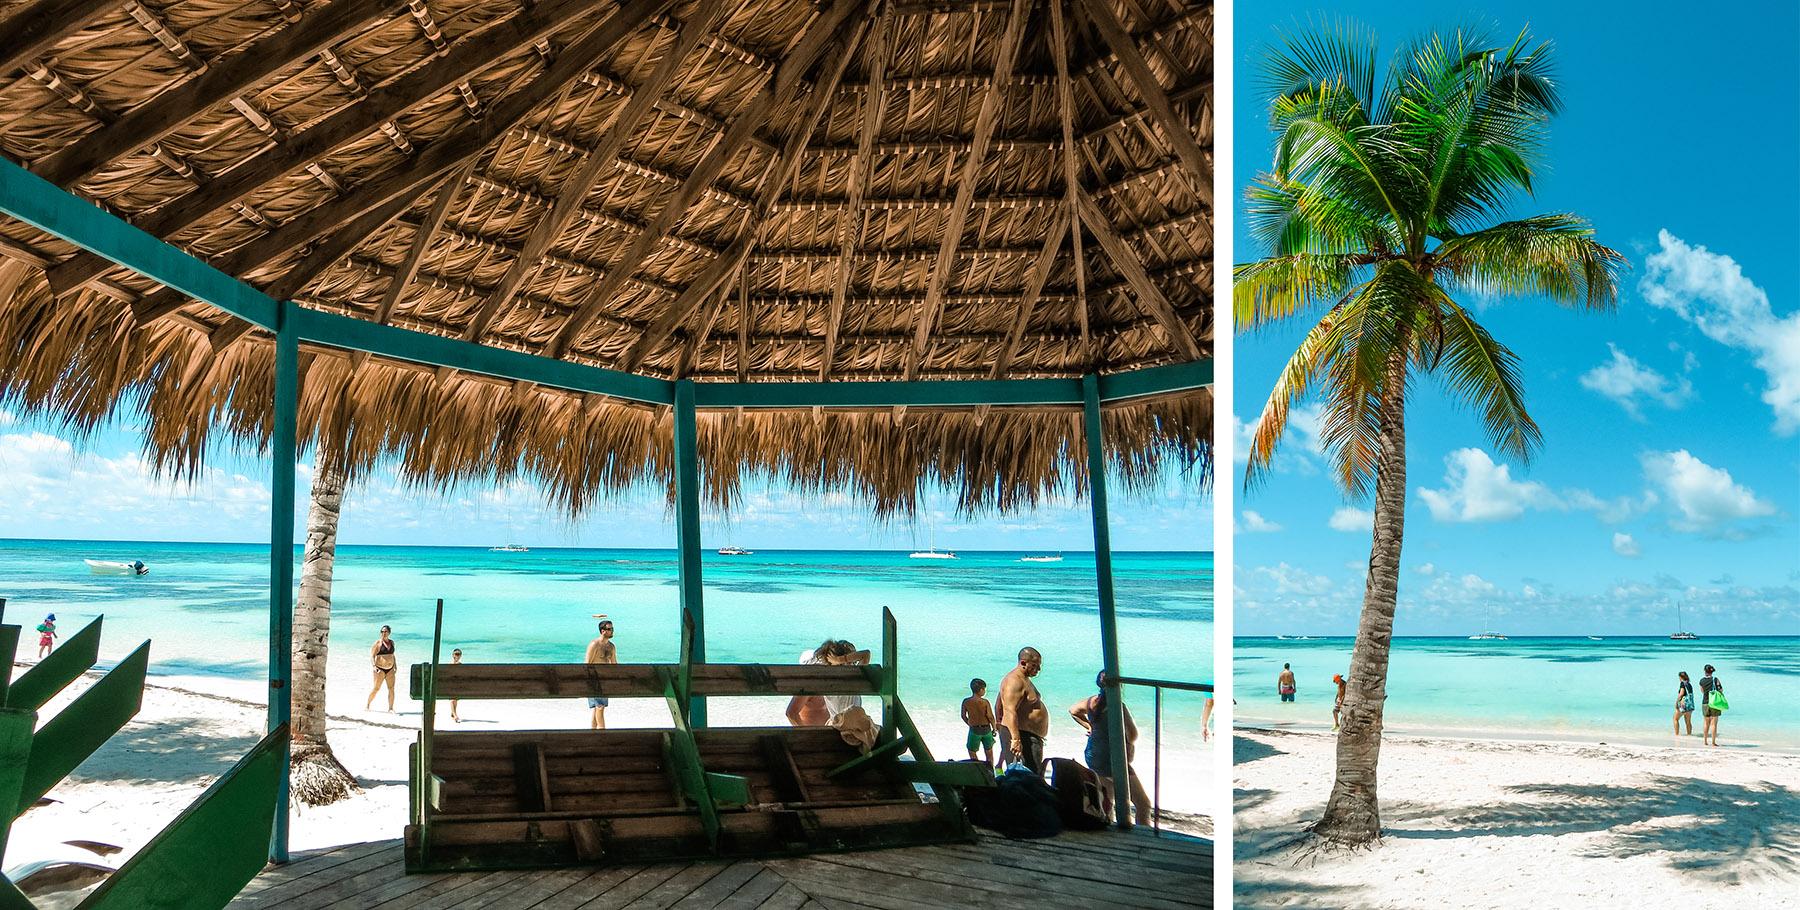 Dominikanische Republik Isla Saona Strand Ankunft